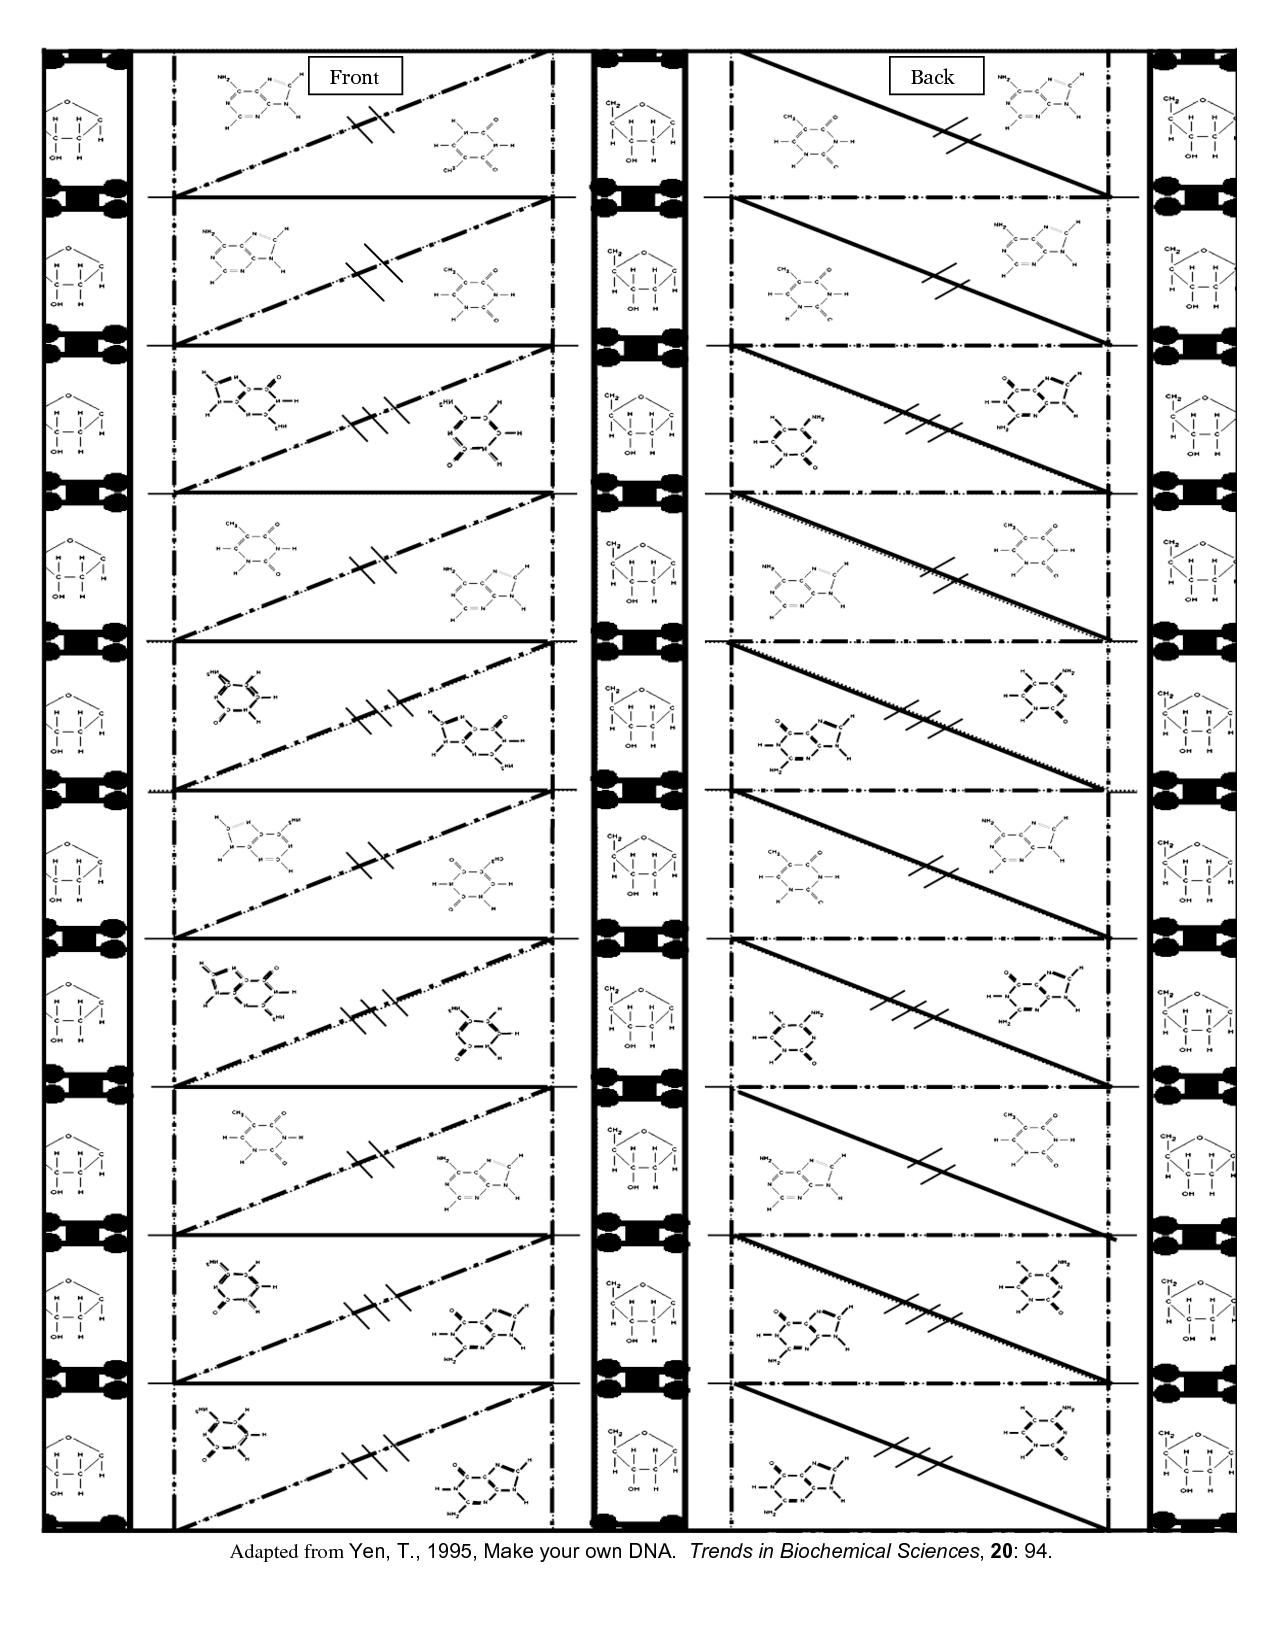 Origami Dna Model Template Blank DNA Template - Bing images | škola ...